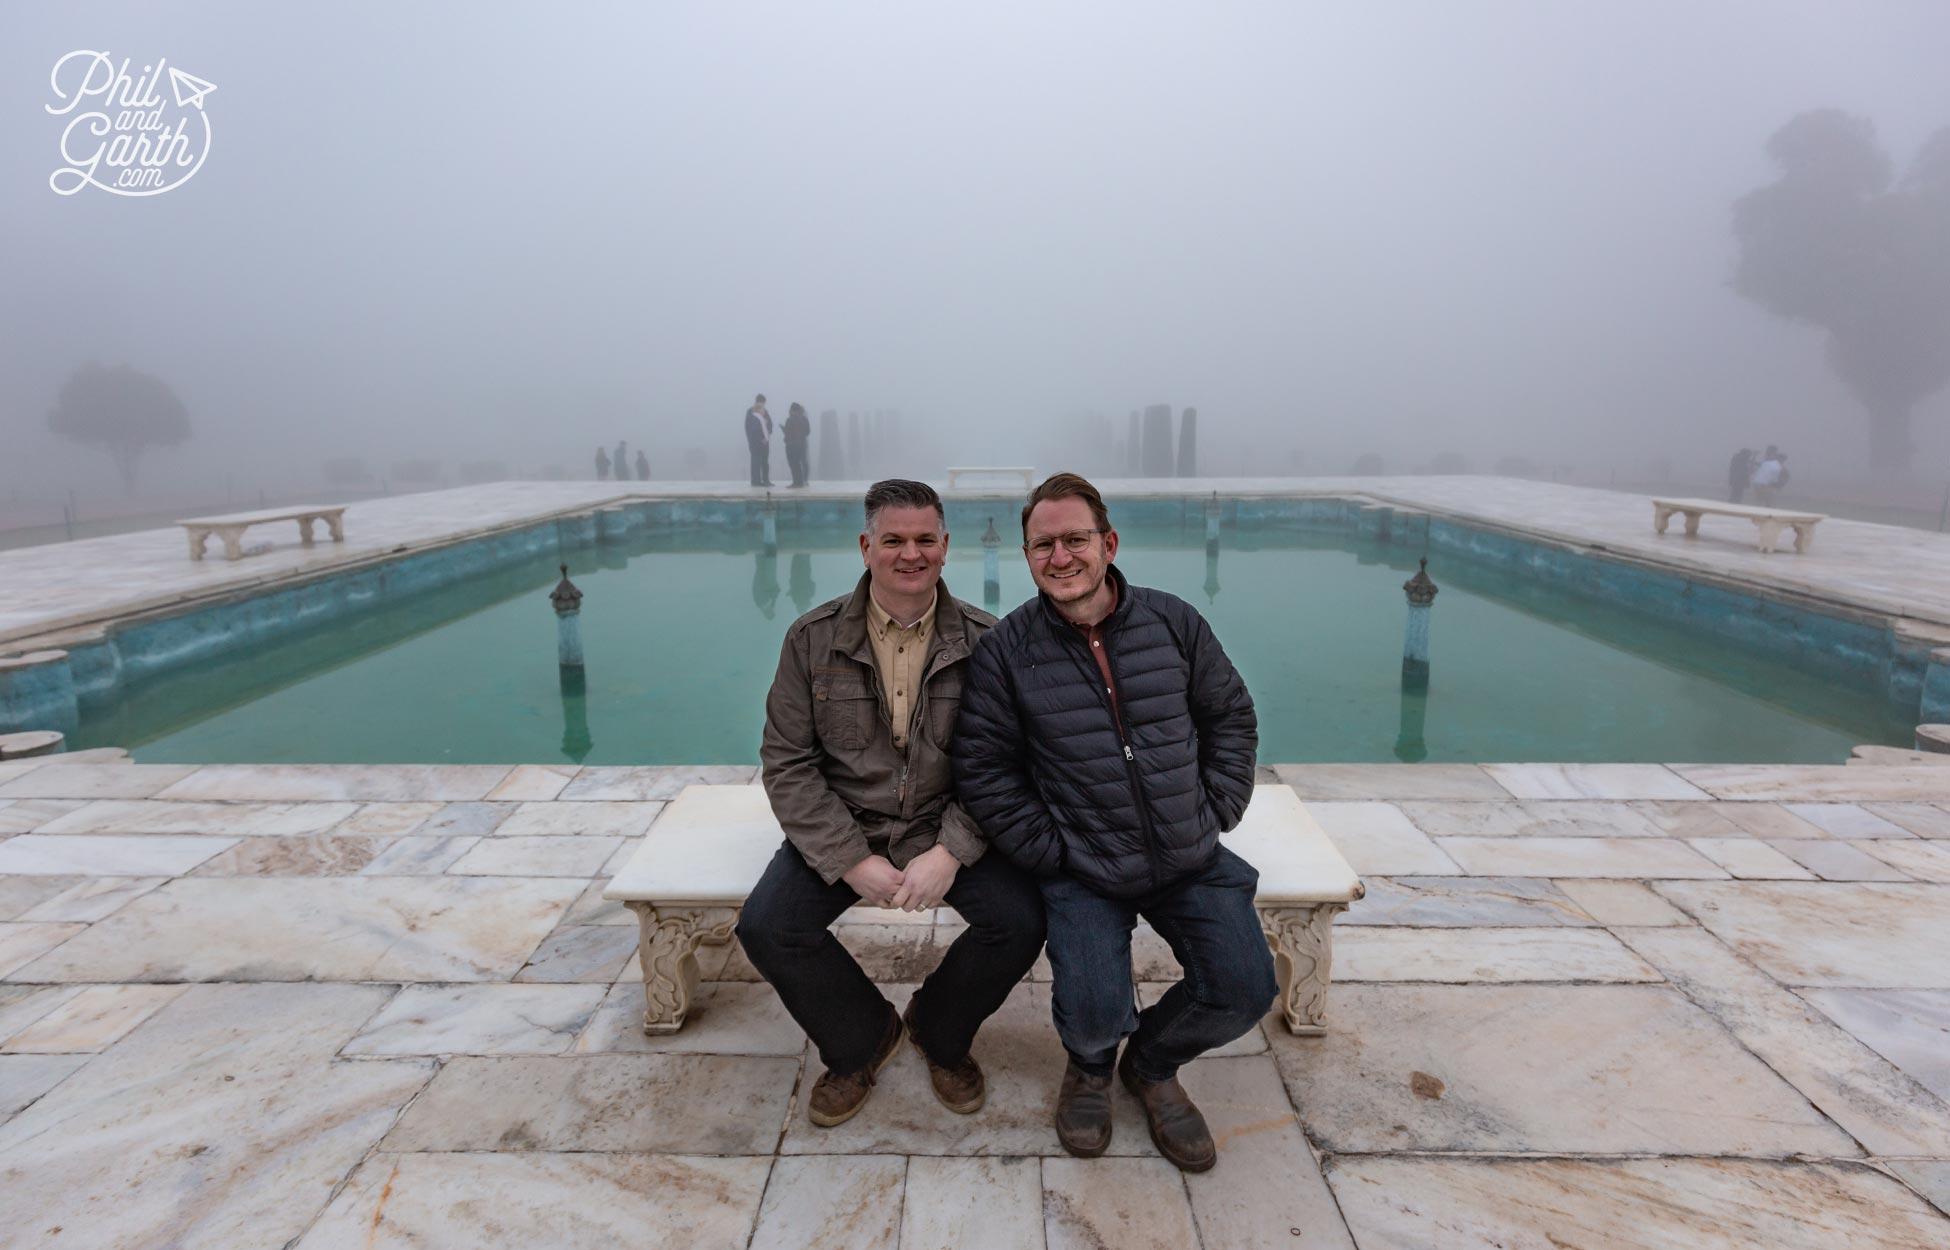 The 'Diana' bench at the Taj Mahal